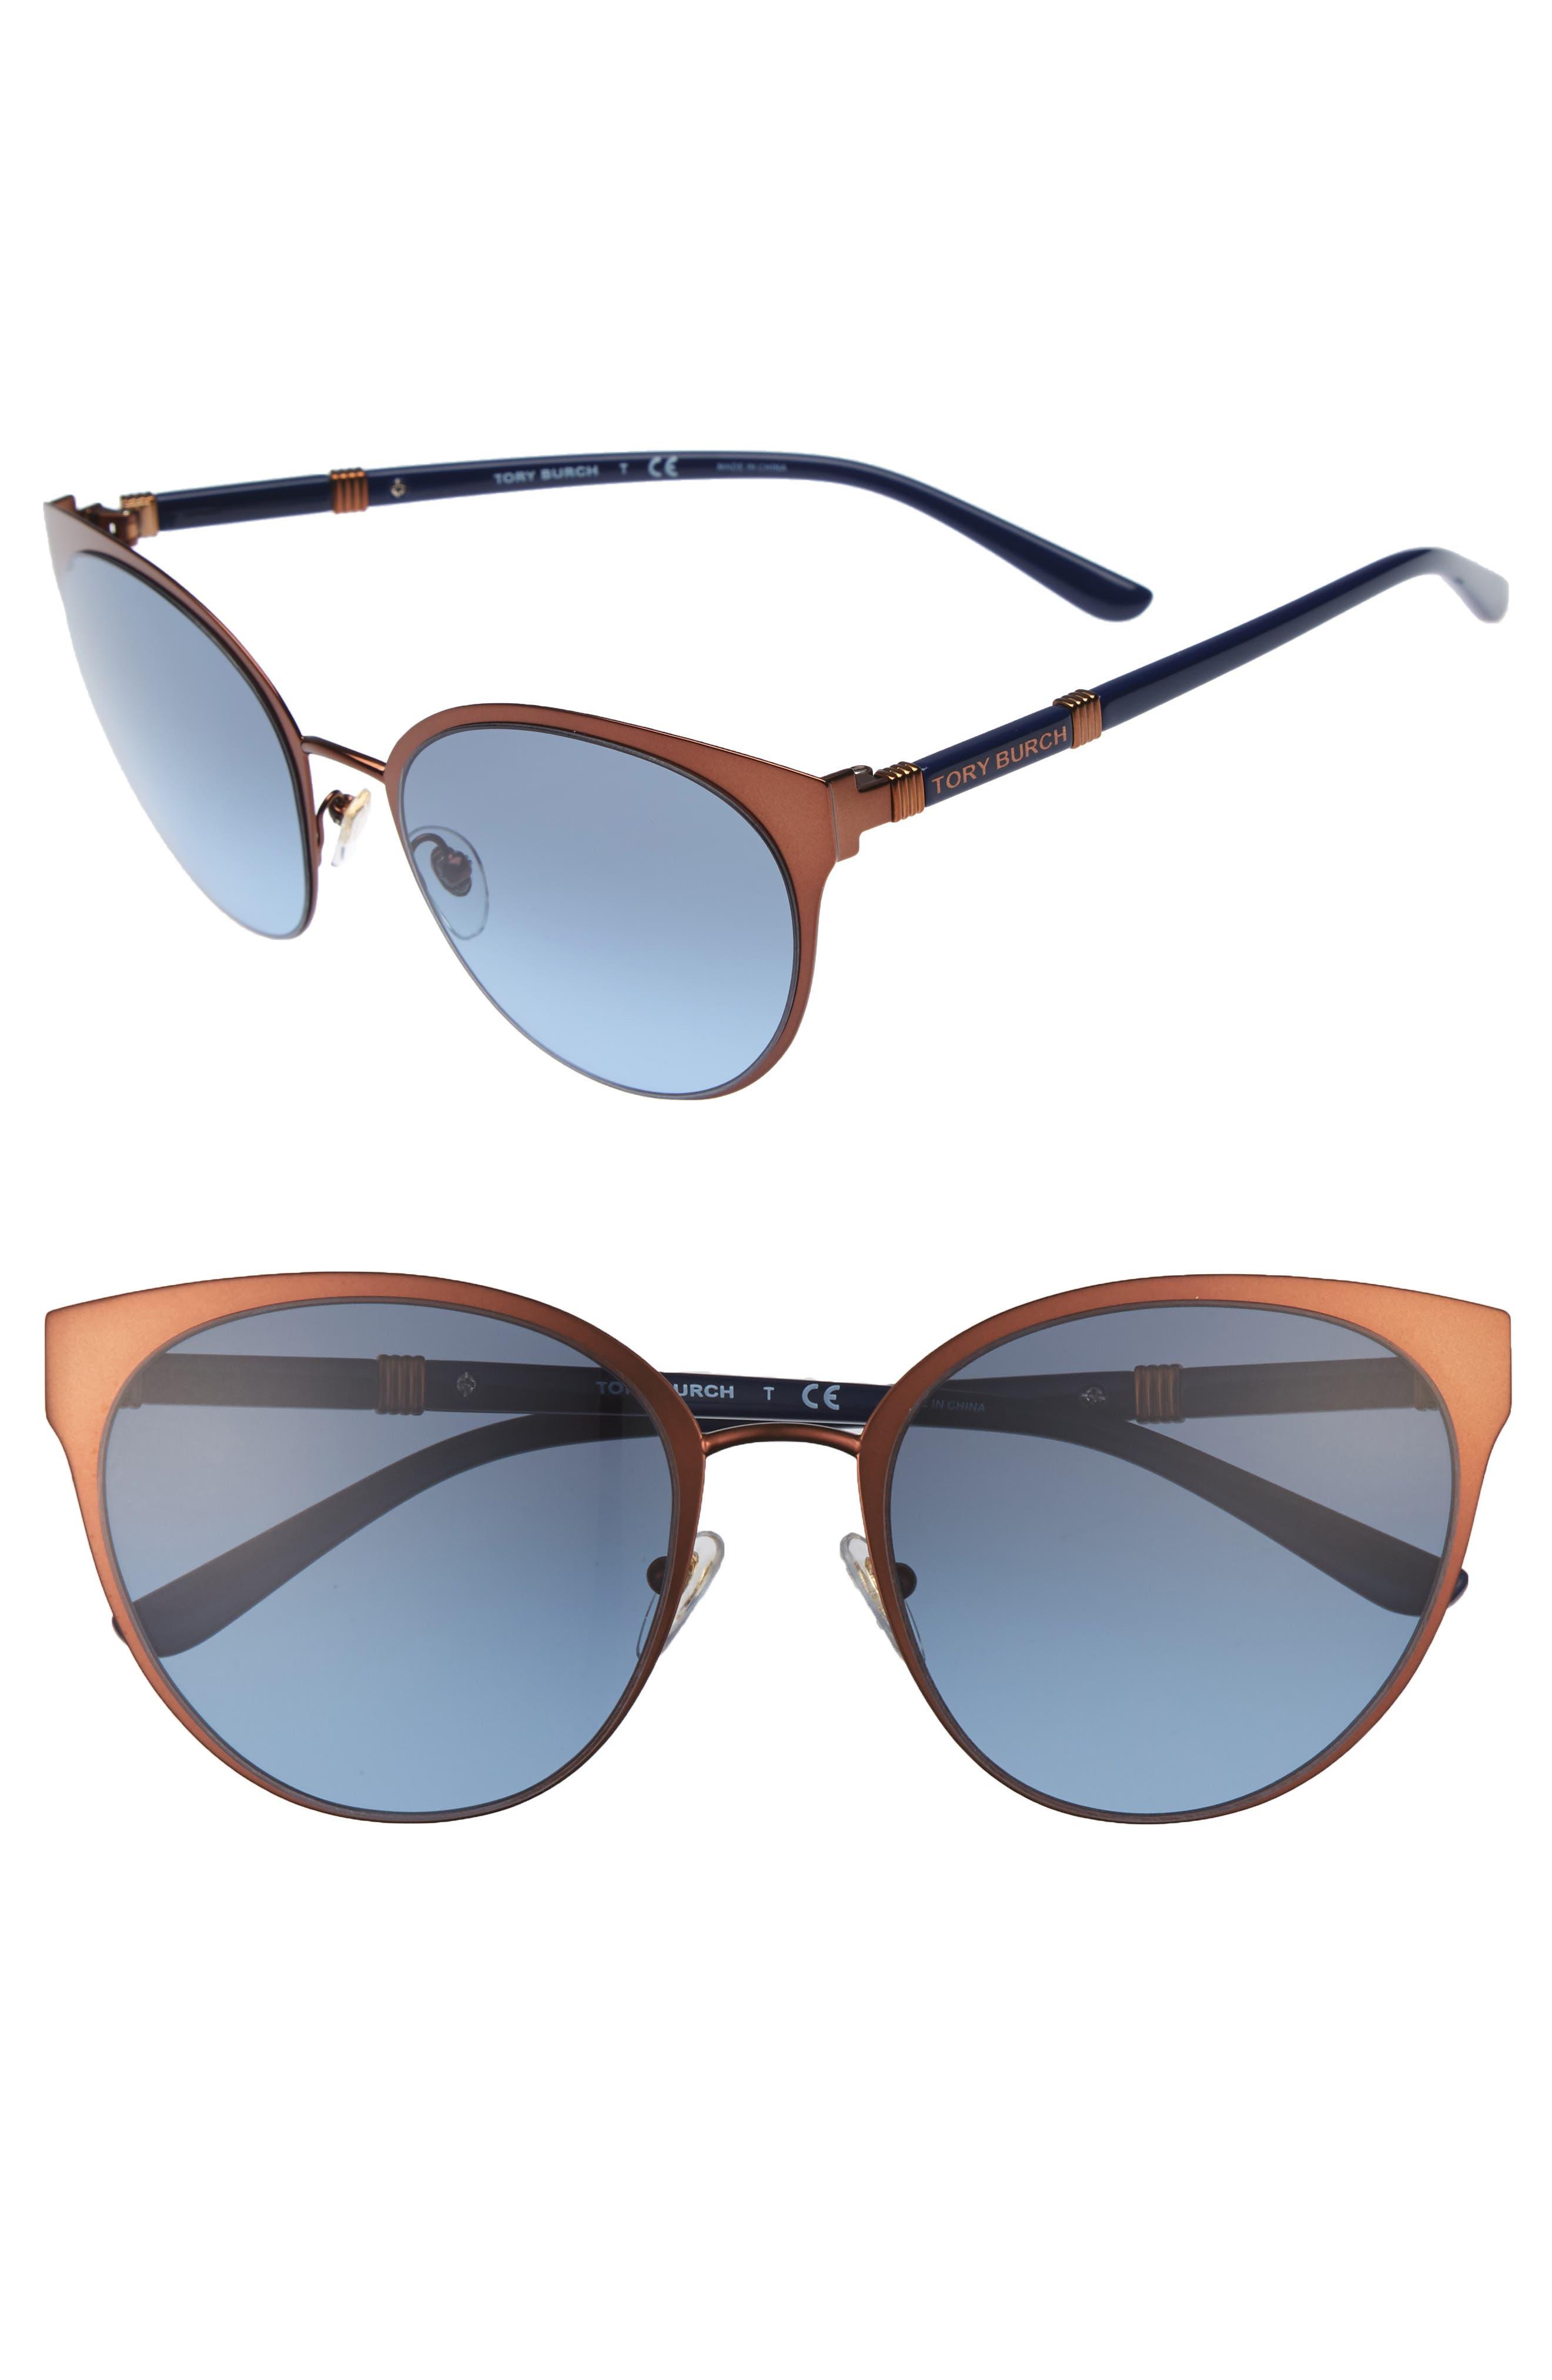 Main Image - Tory Burch 55mm Cat Eye Sunglasses